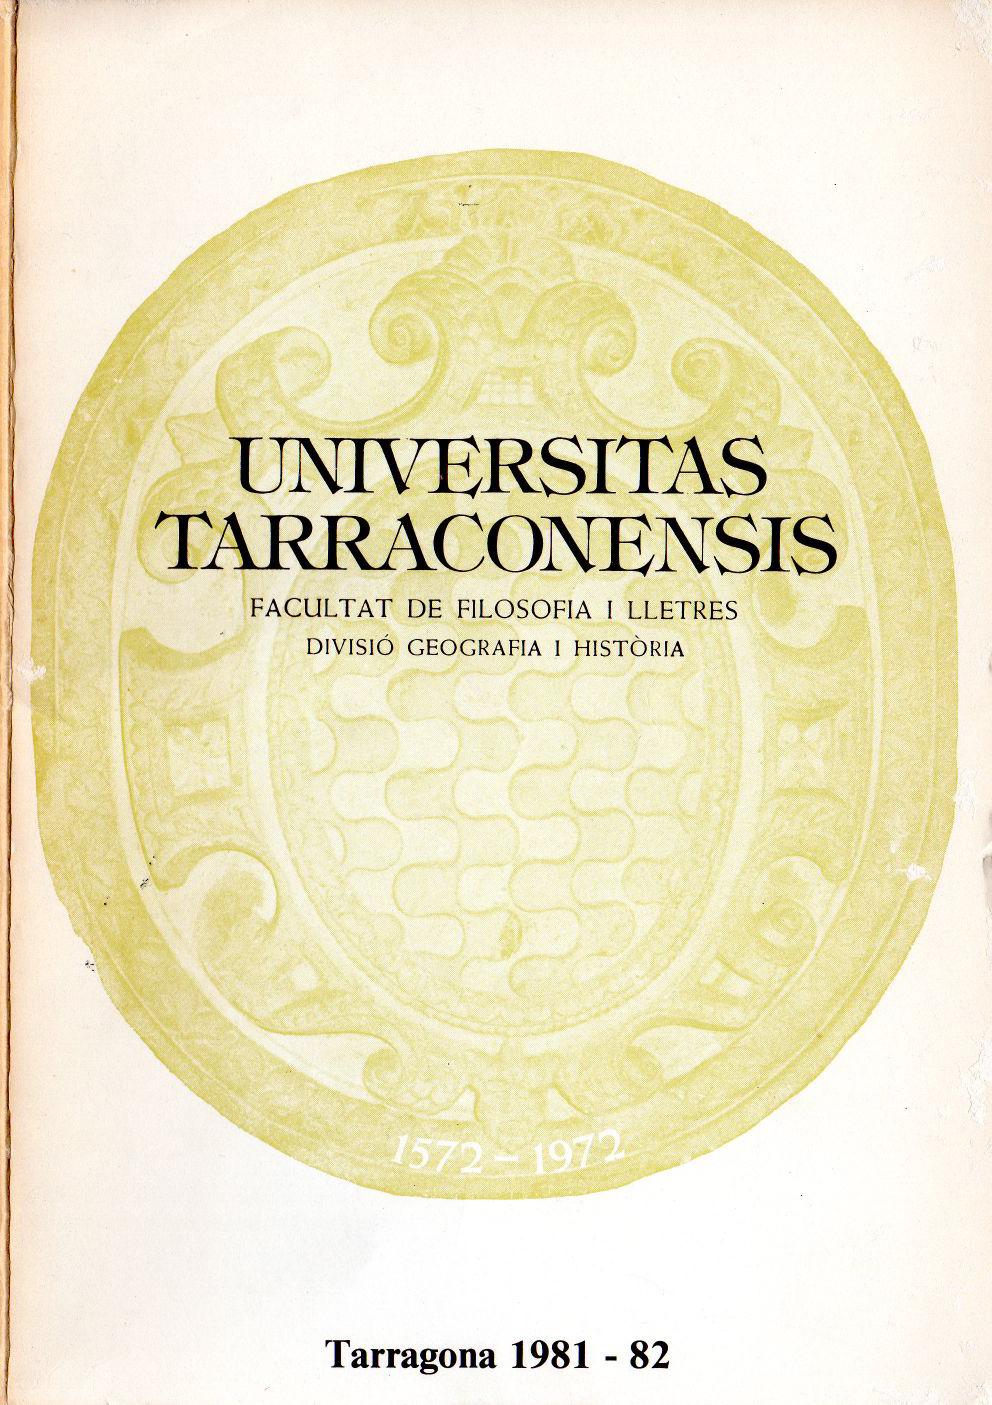 Universitas Tarraconensis. Revista de Geografia, Història i Filosofia. 1981-1982